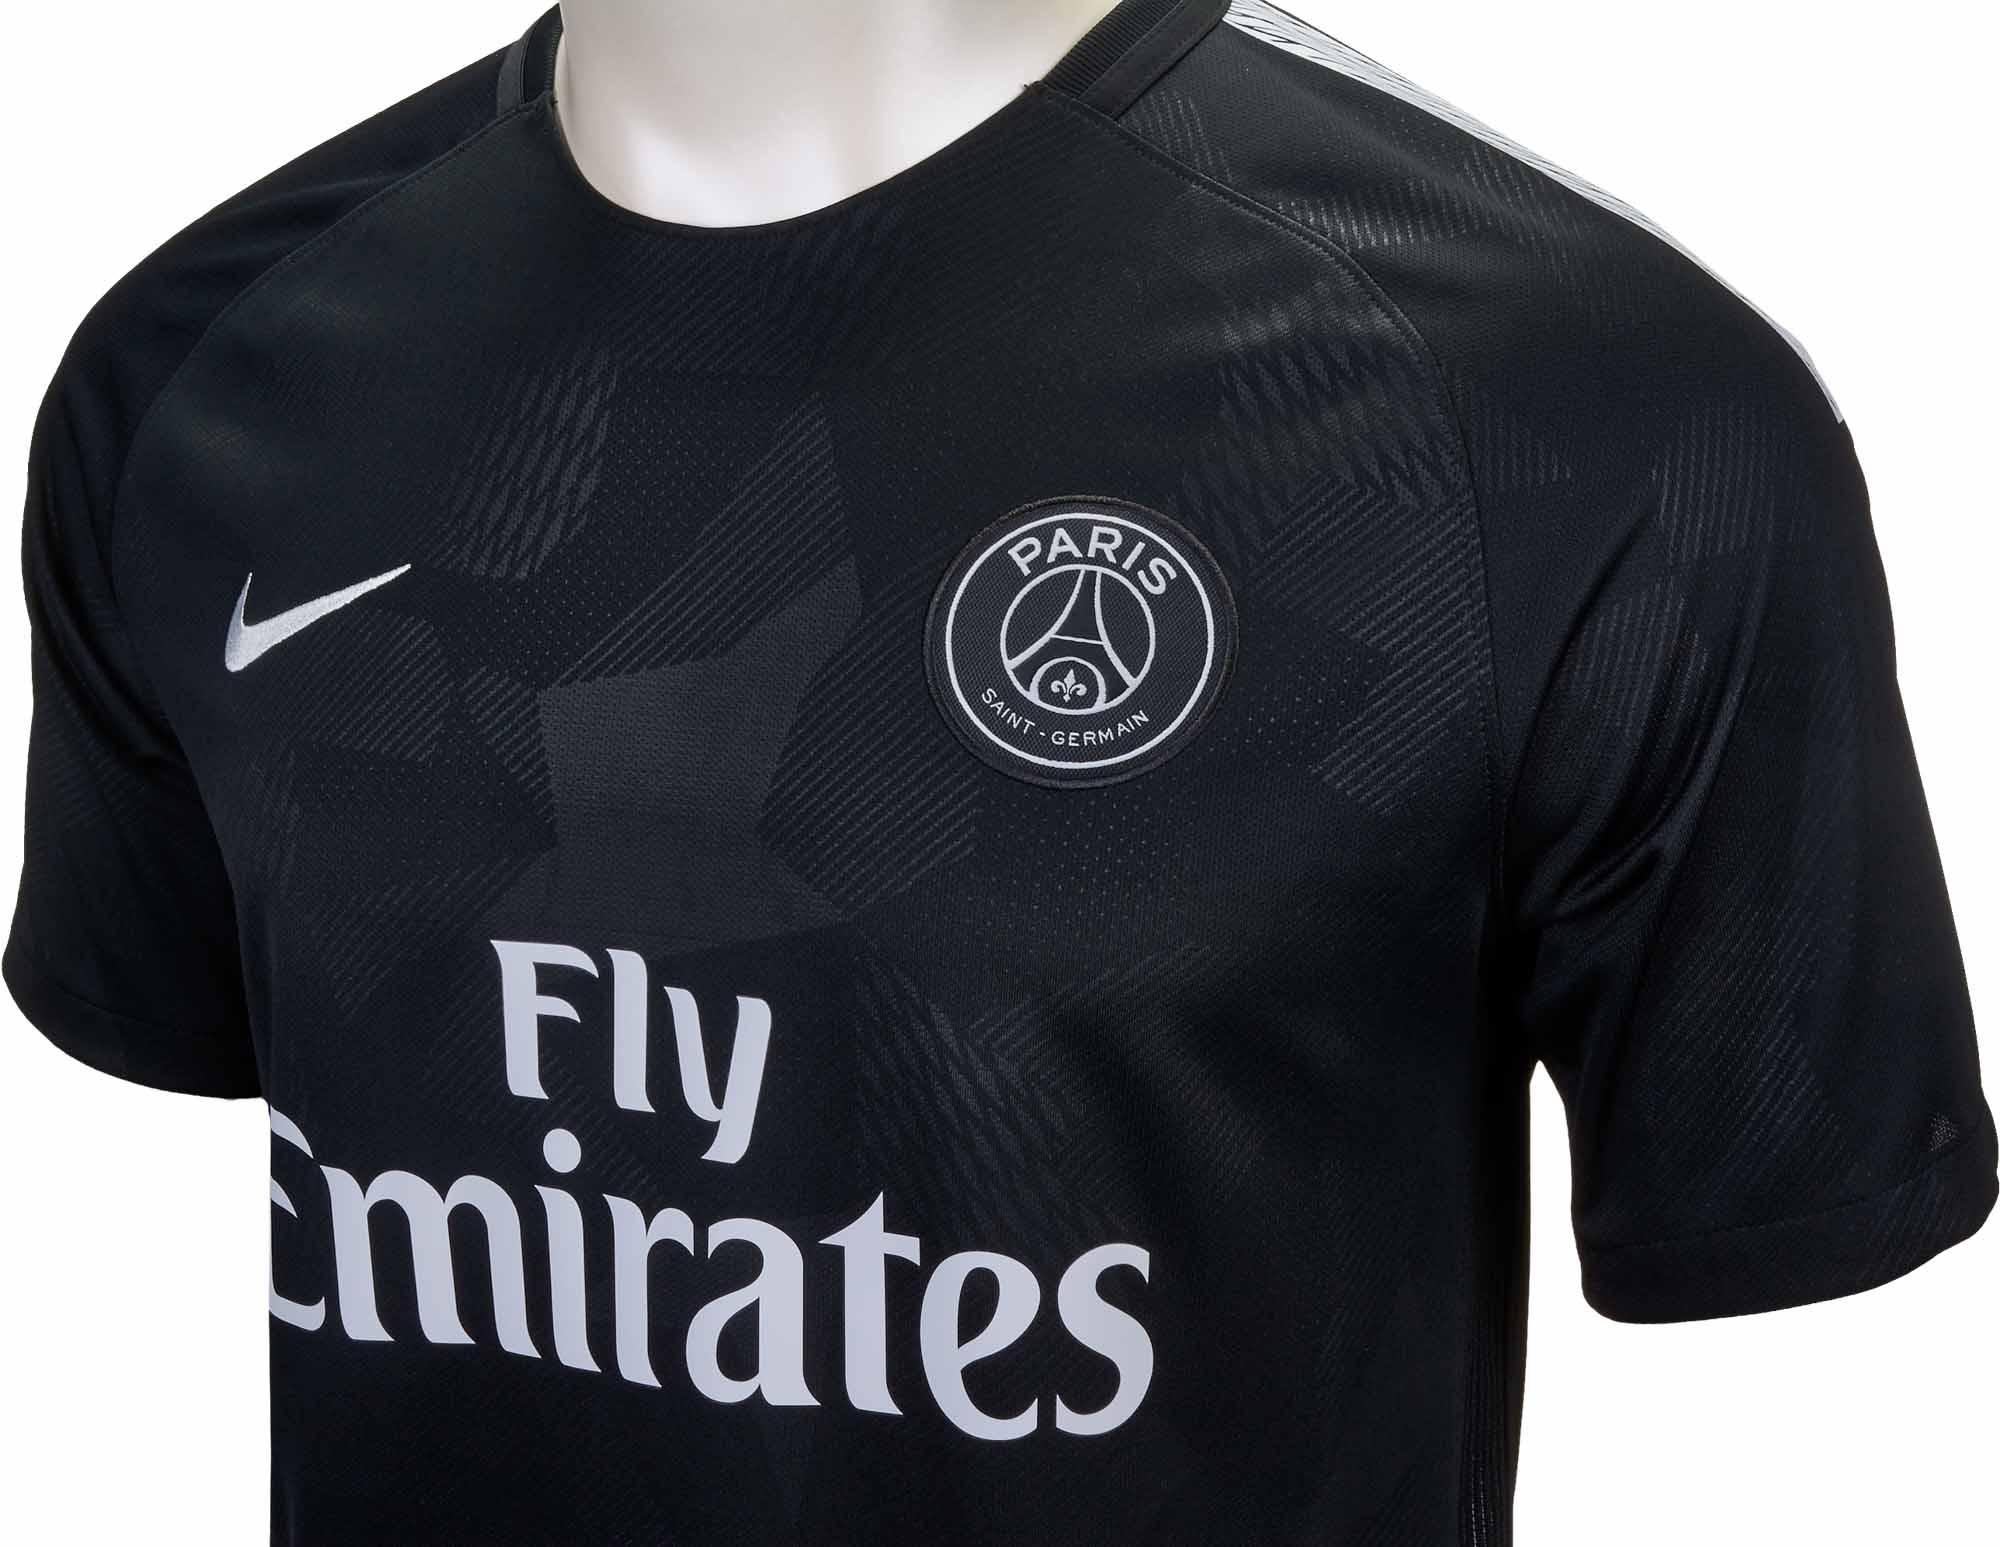 the best attitude ed4dc 8b232 Nike Paris Saint-Germain 3rd Jersey - 17/18 PSG Jerseys